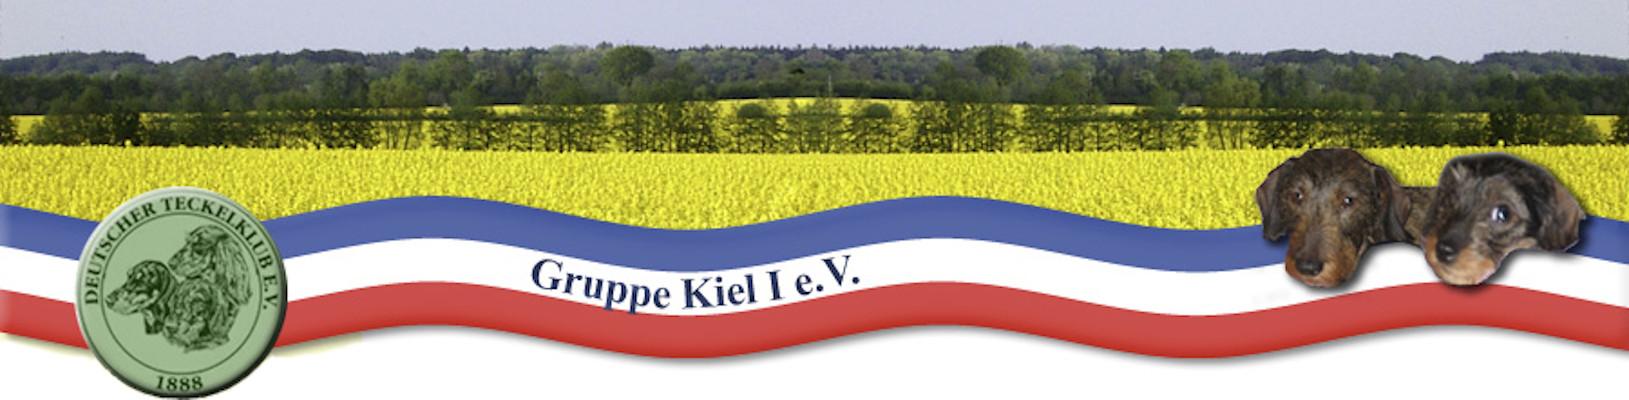 DTK Gruppe Kiel I e.V.